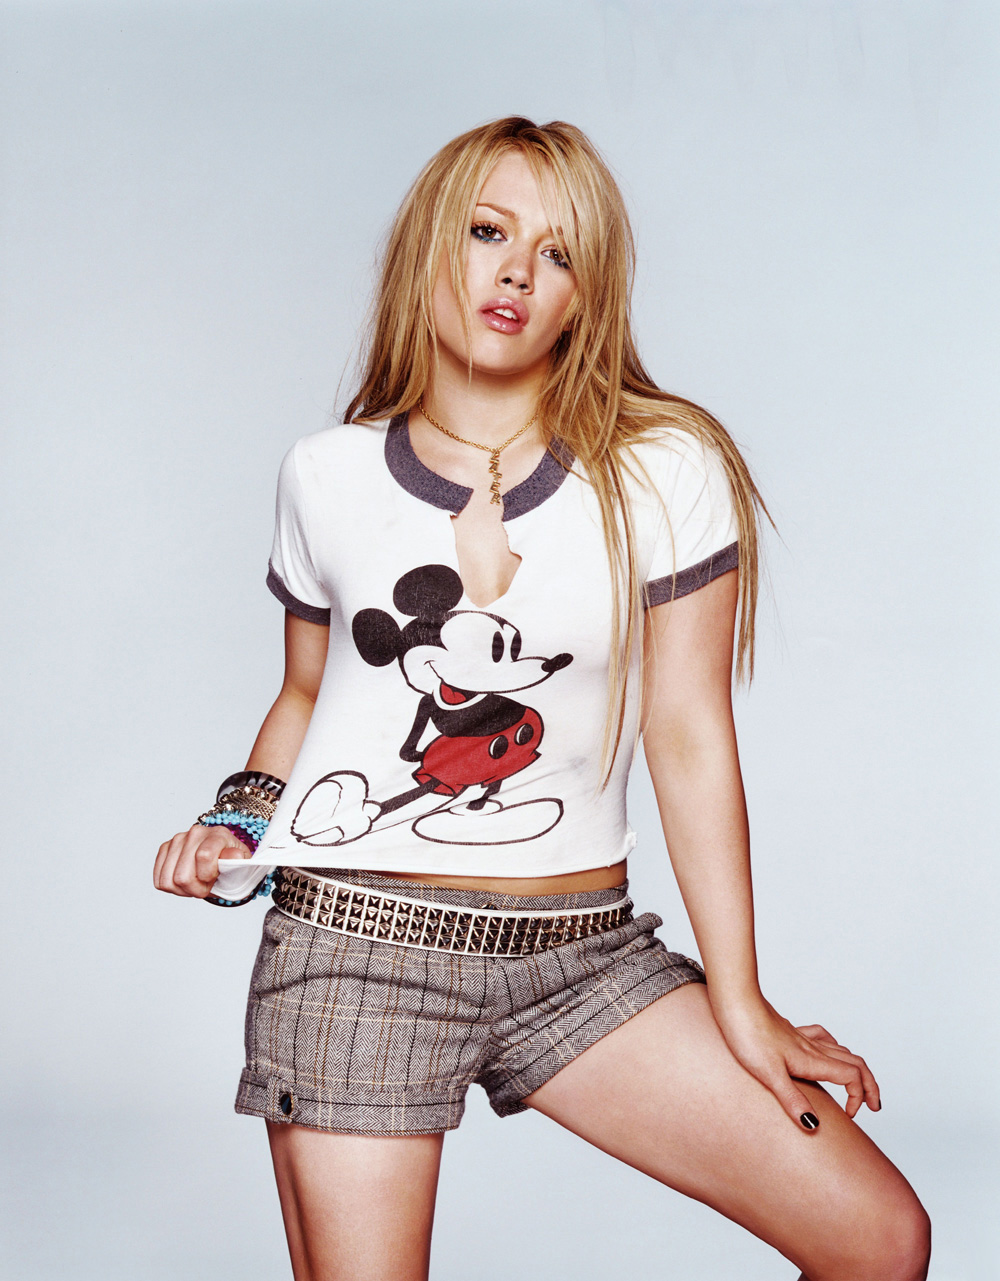 http://st.kinopoisk.ru/im/kadr/1/1/0/kinopoisk.ru-Hilary-Duff-1106870.jpg